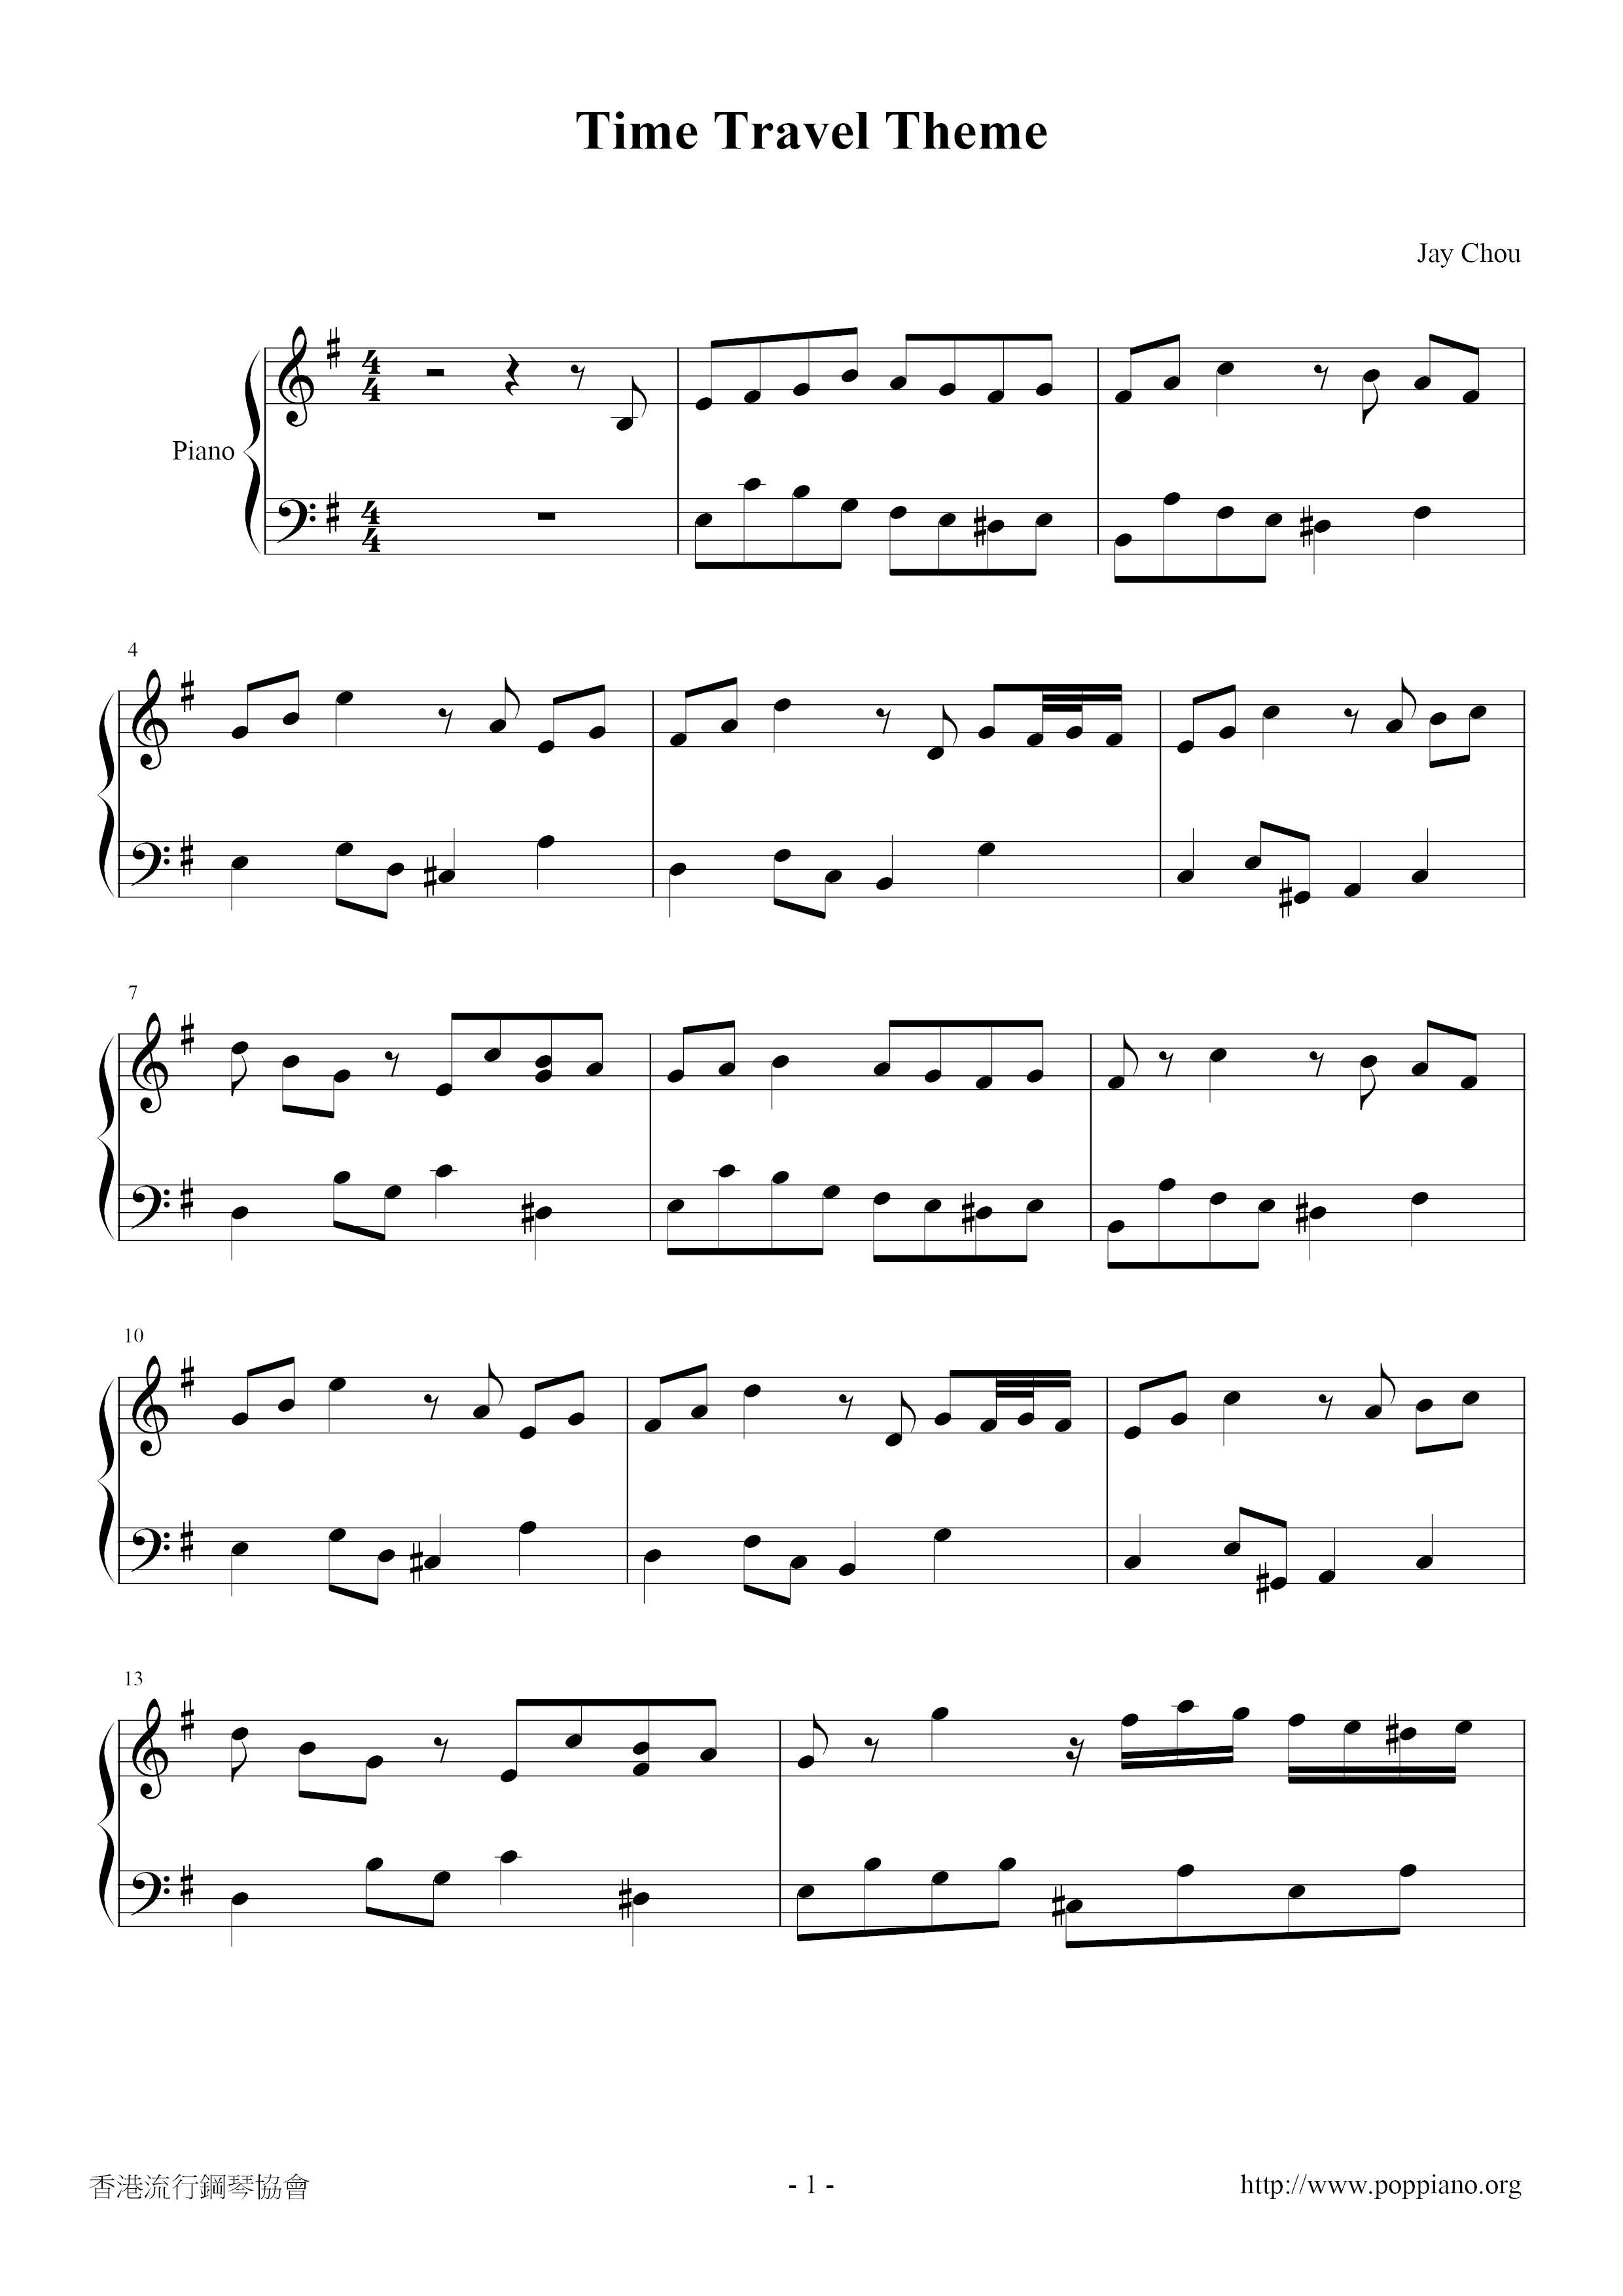 Jay Chou-Time Travel Theme Sheet Music pdf, - Free Score ...